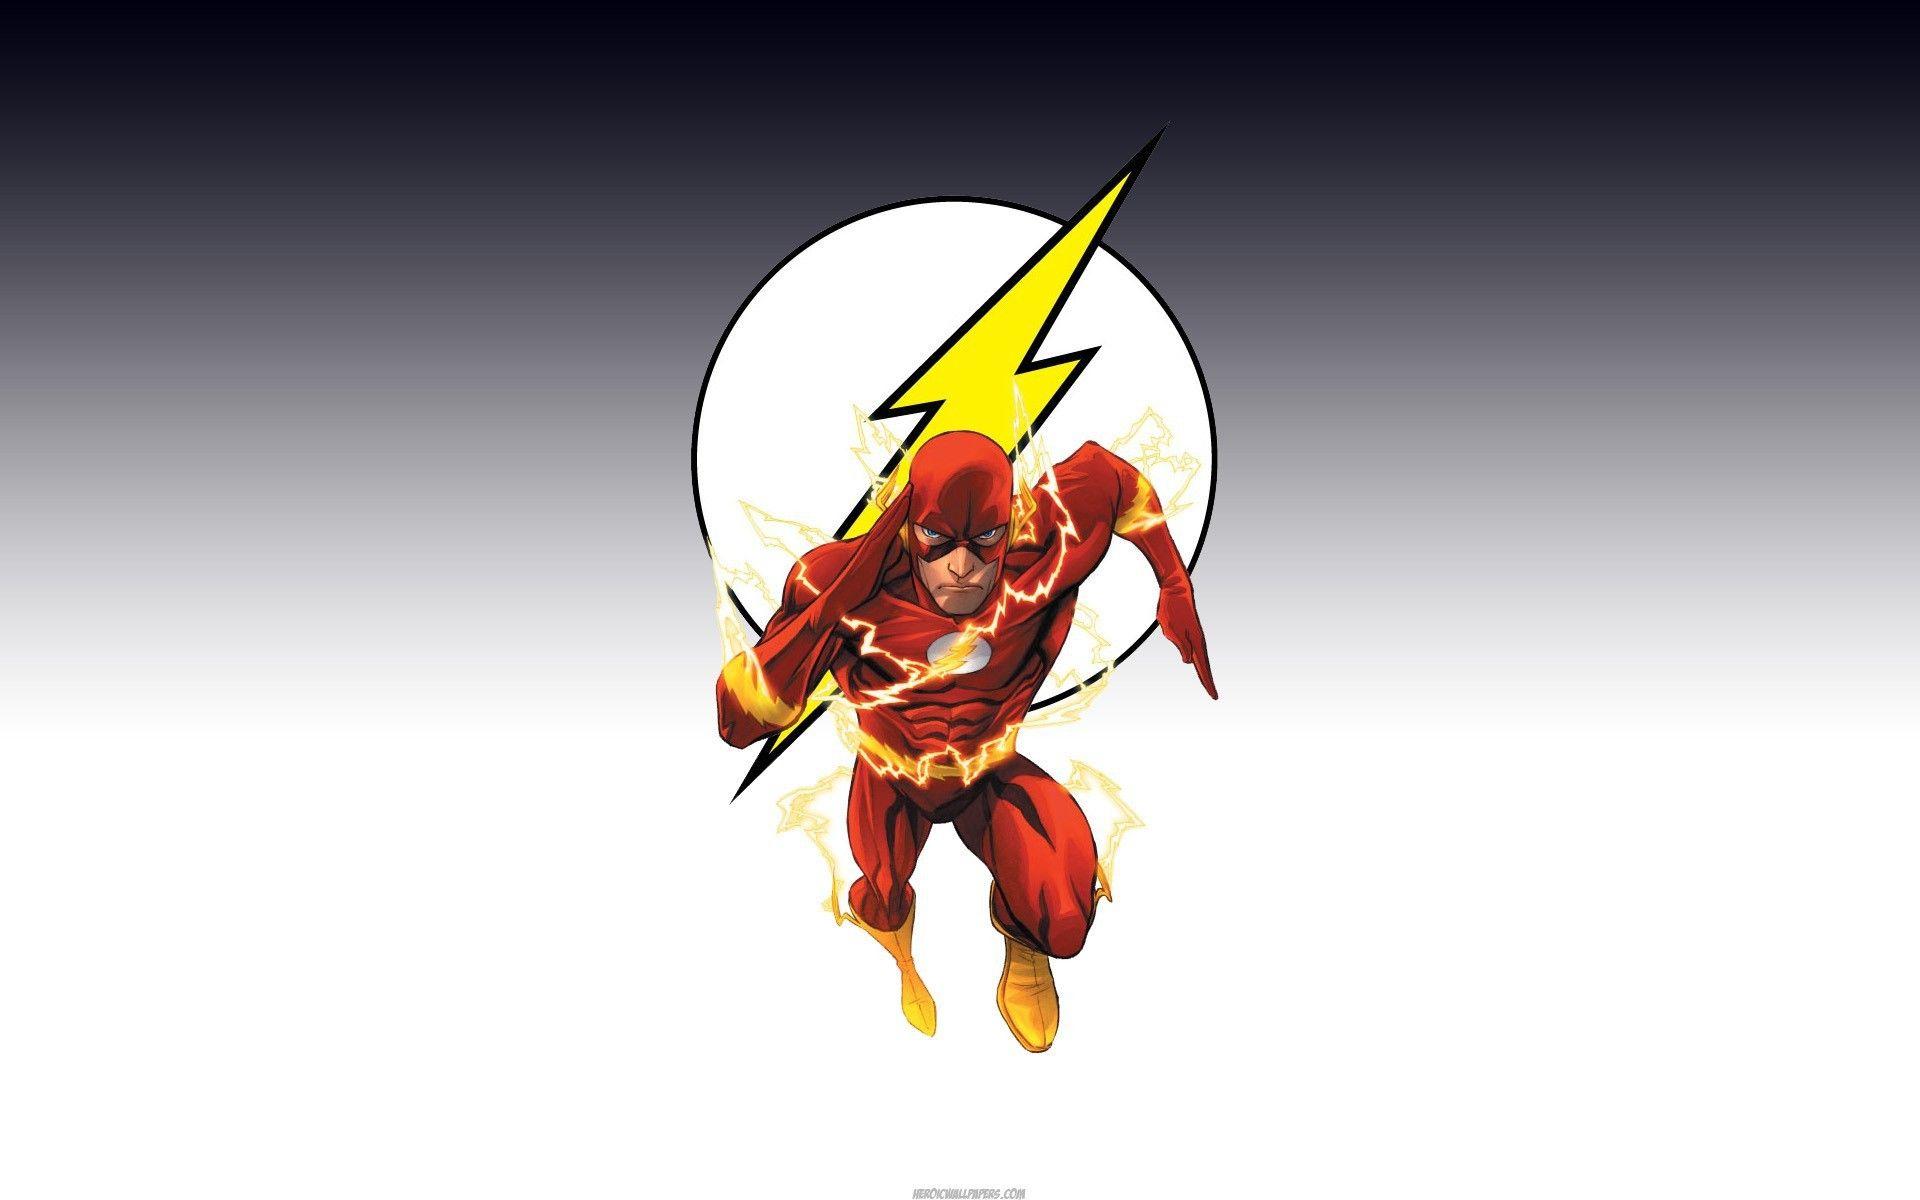 Dc Comics Superheroes Flash Comic Hero Wallpaper Superhero Wallpaper Hd Flash Comics Hero Wallpaper